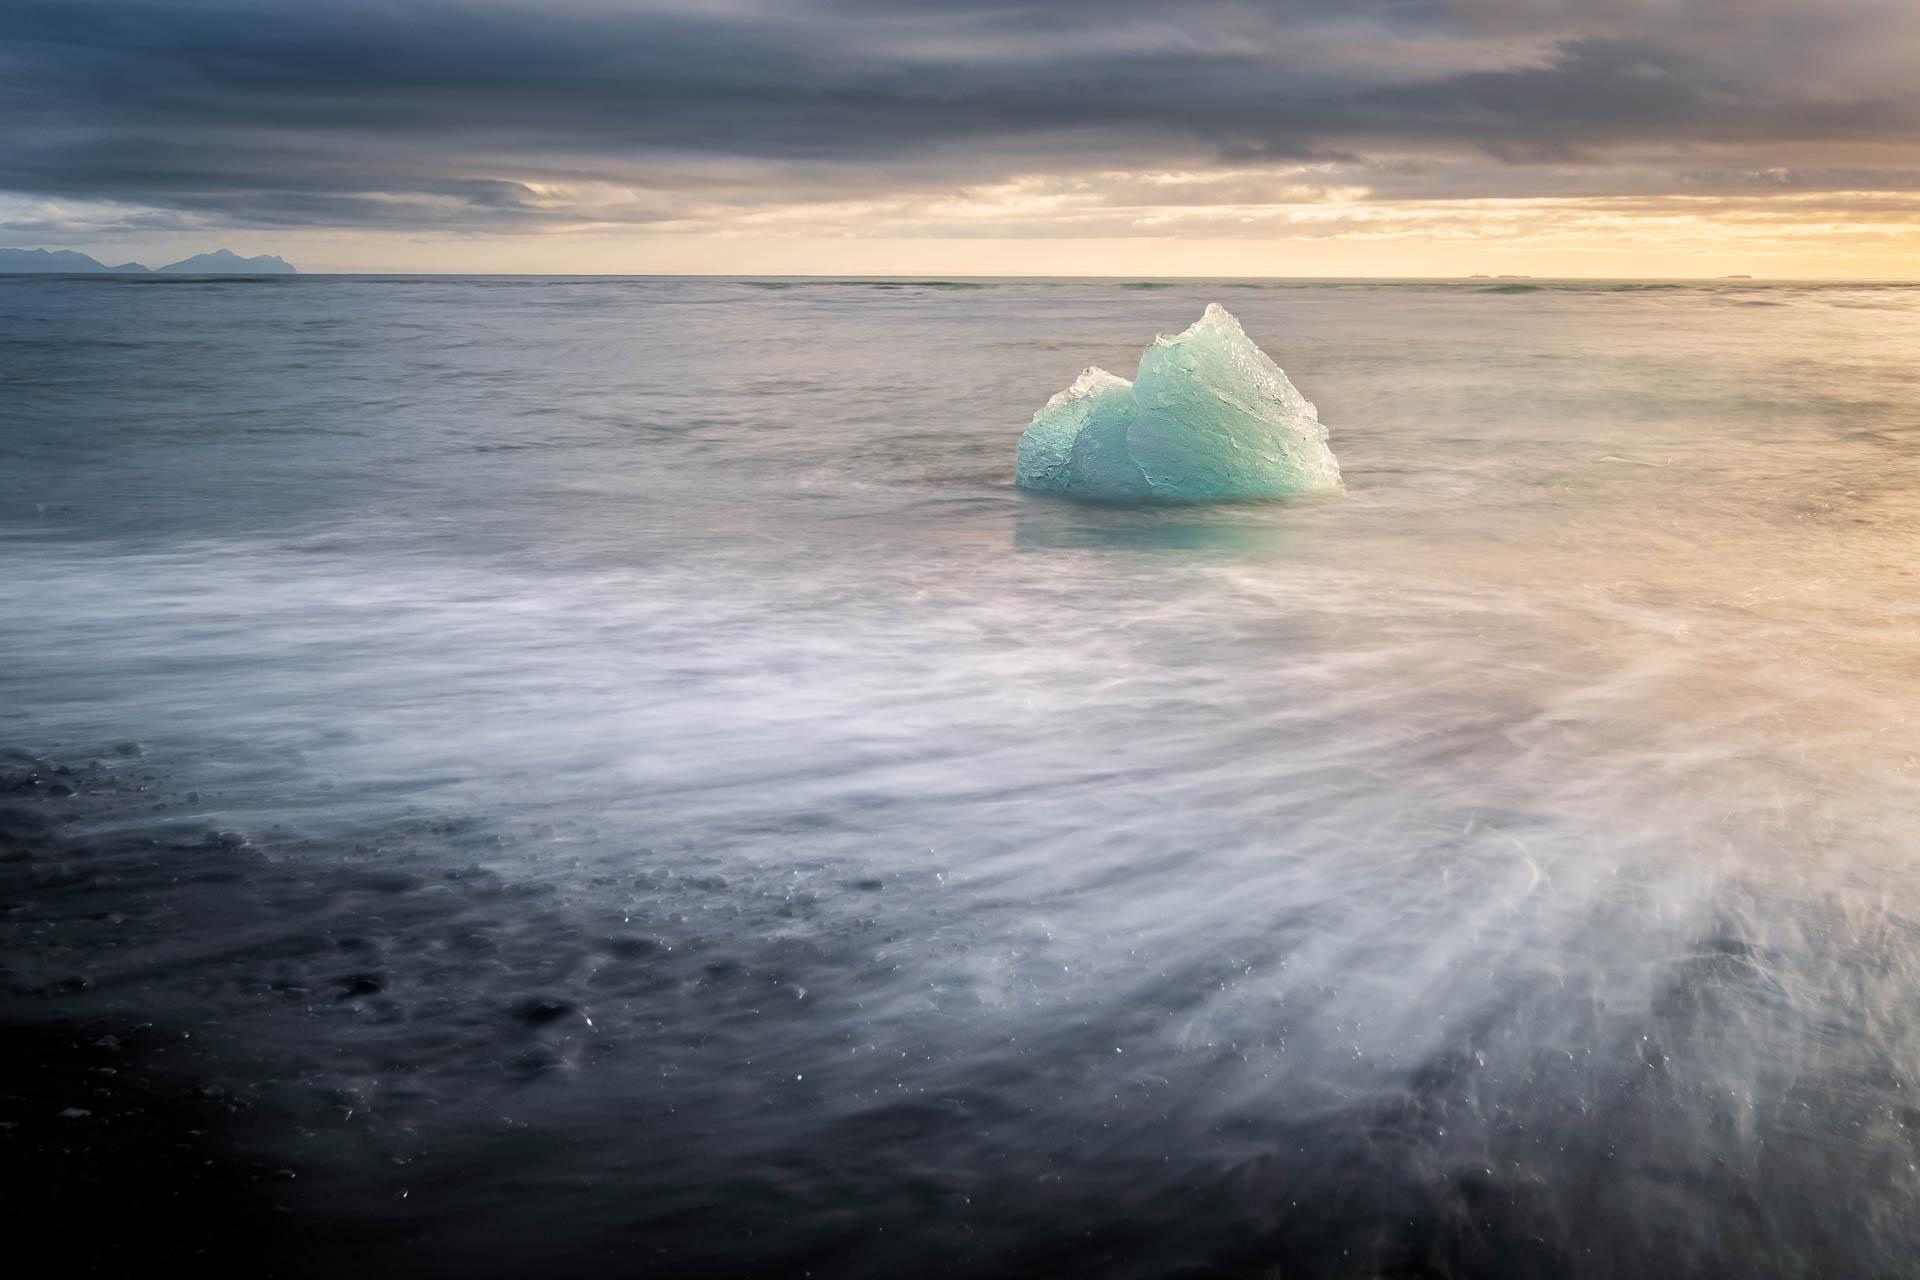 Iceberg in Diamond Beach in Iceland